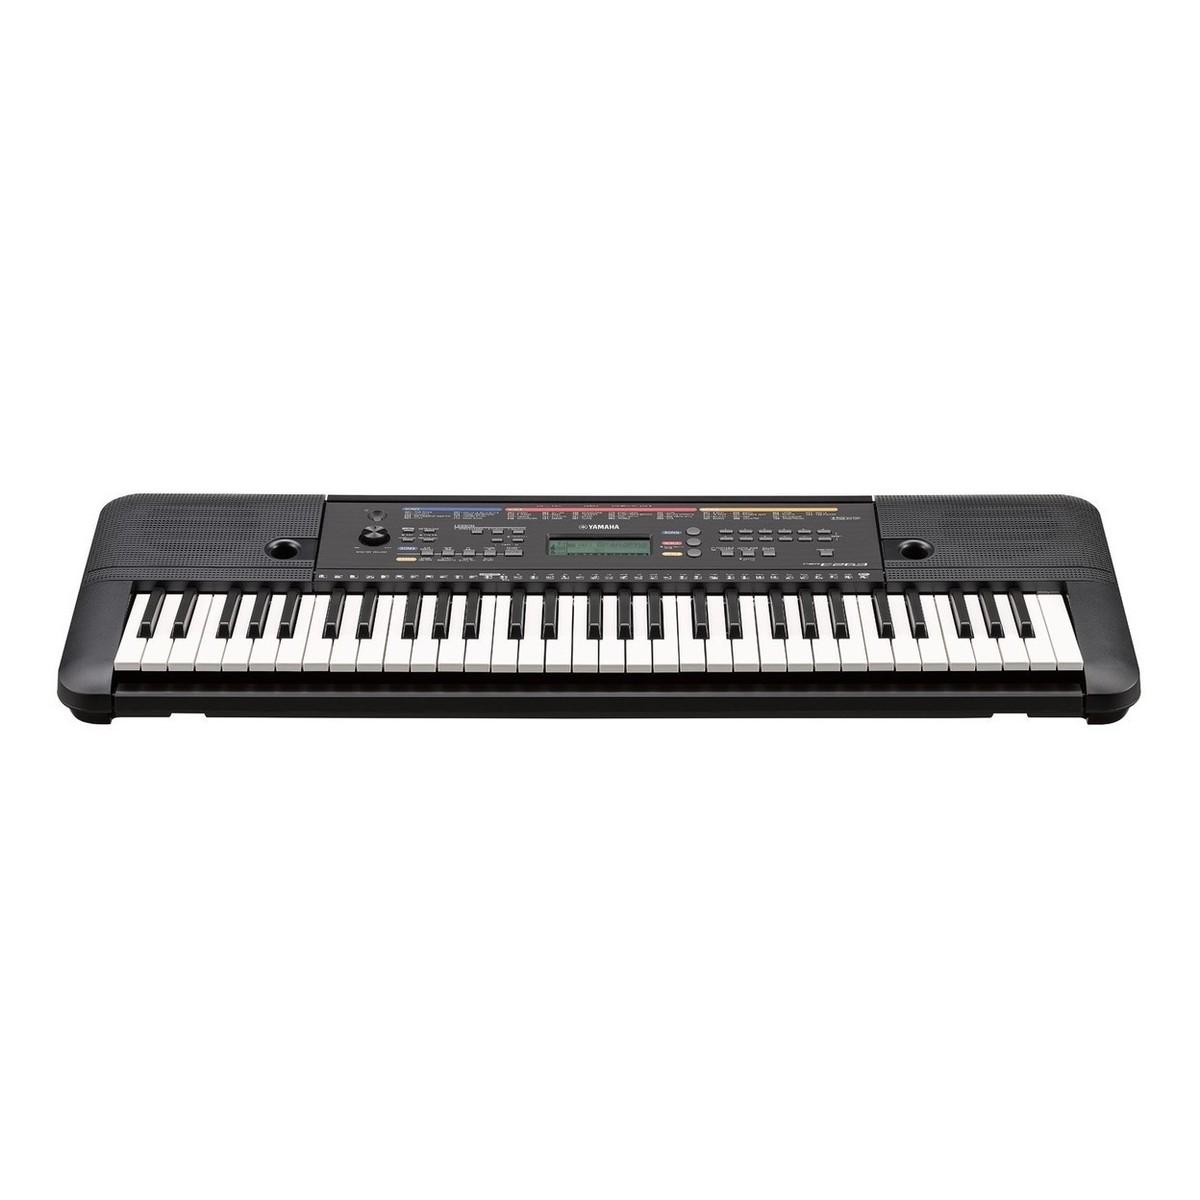 Yamaha psr e263 portable keyboard with stand bench and for Yamaha psr stand